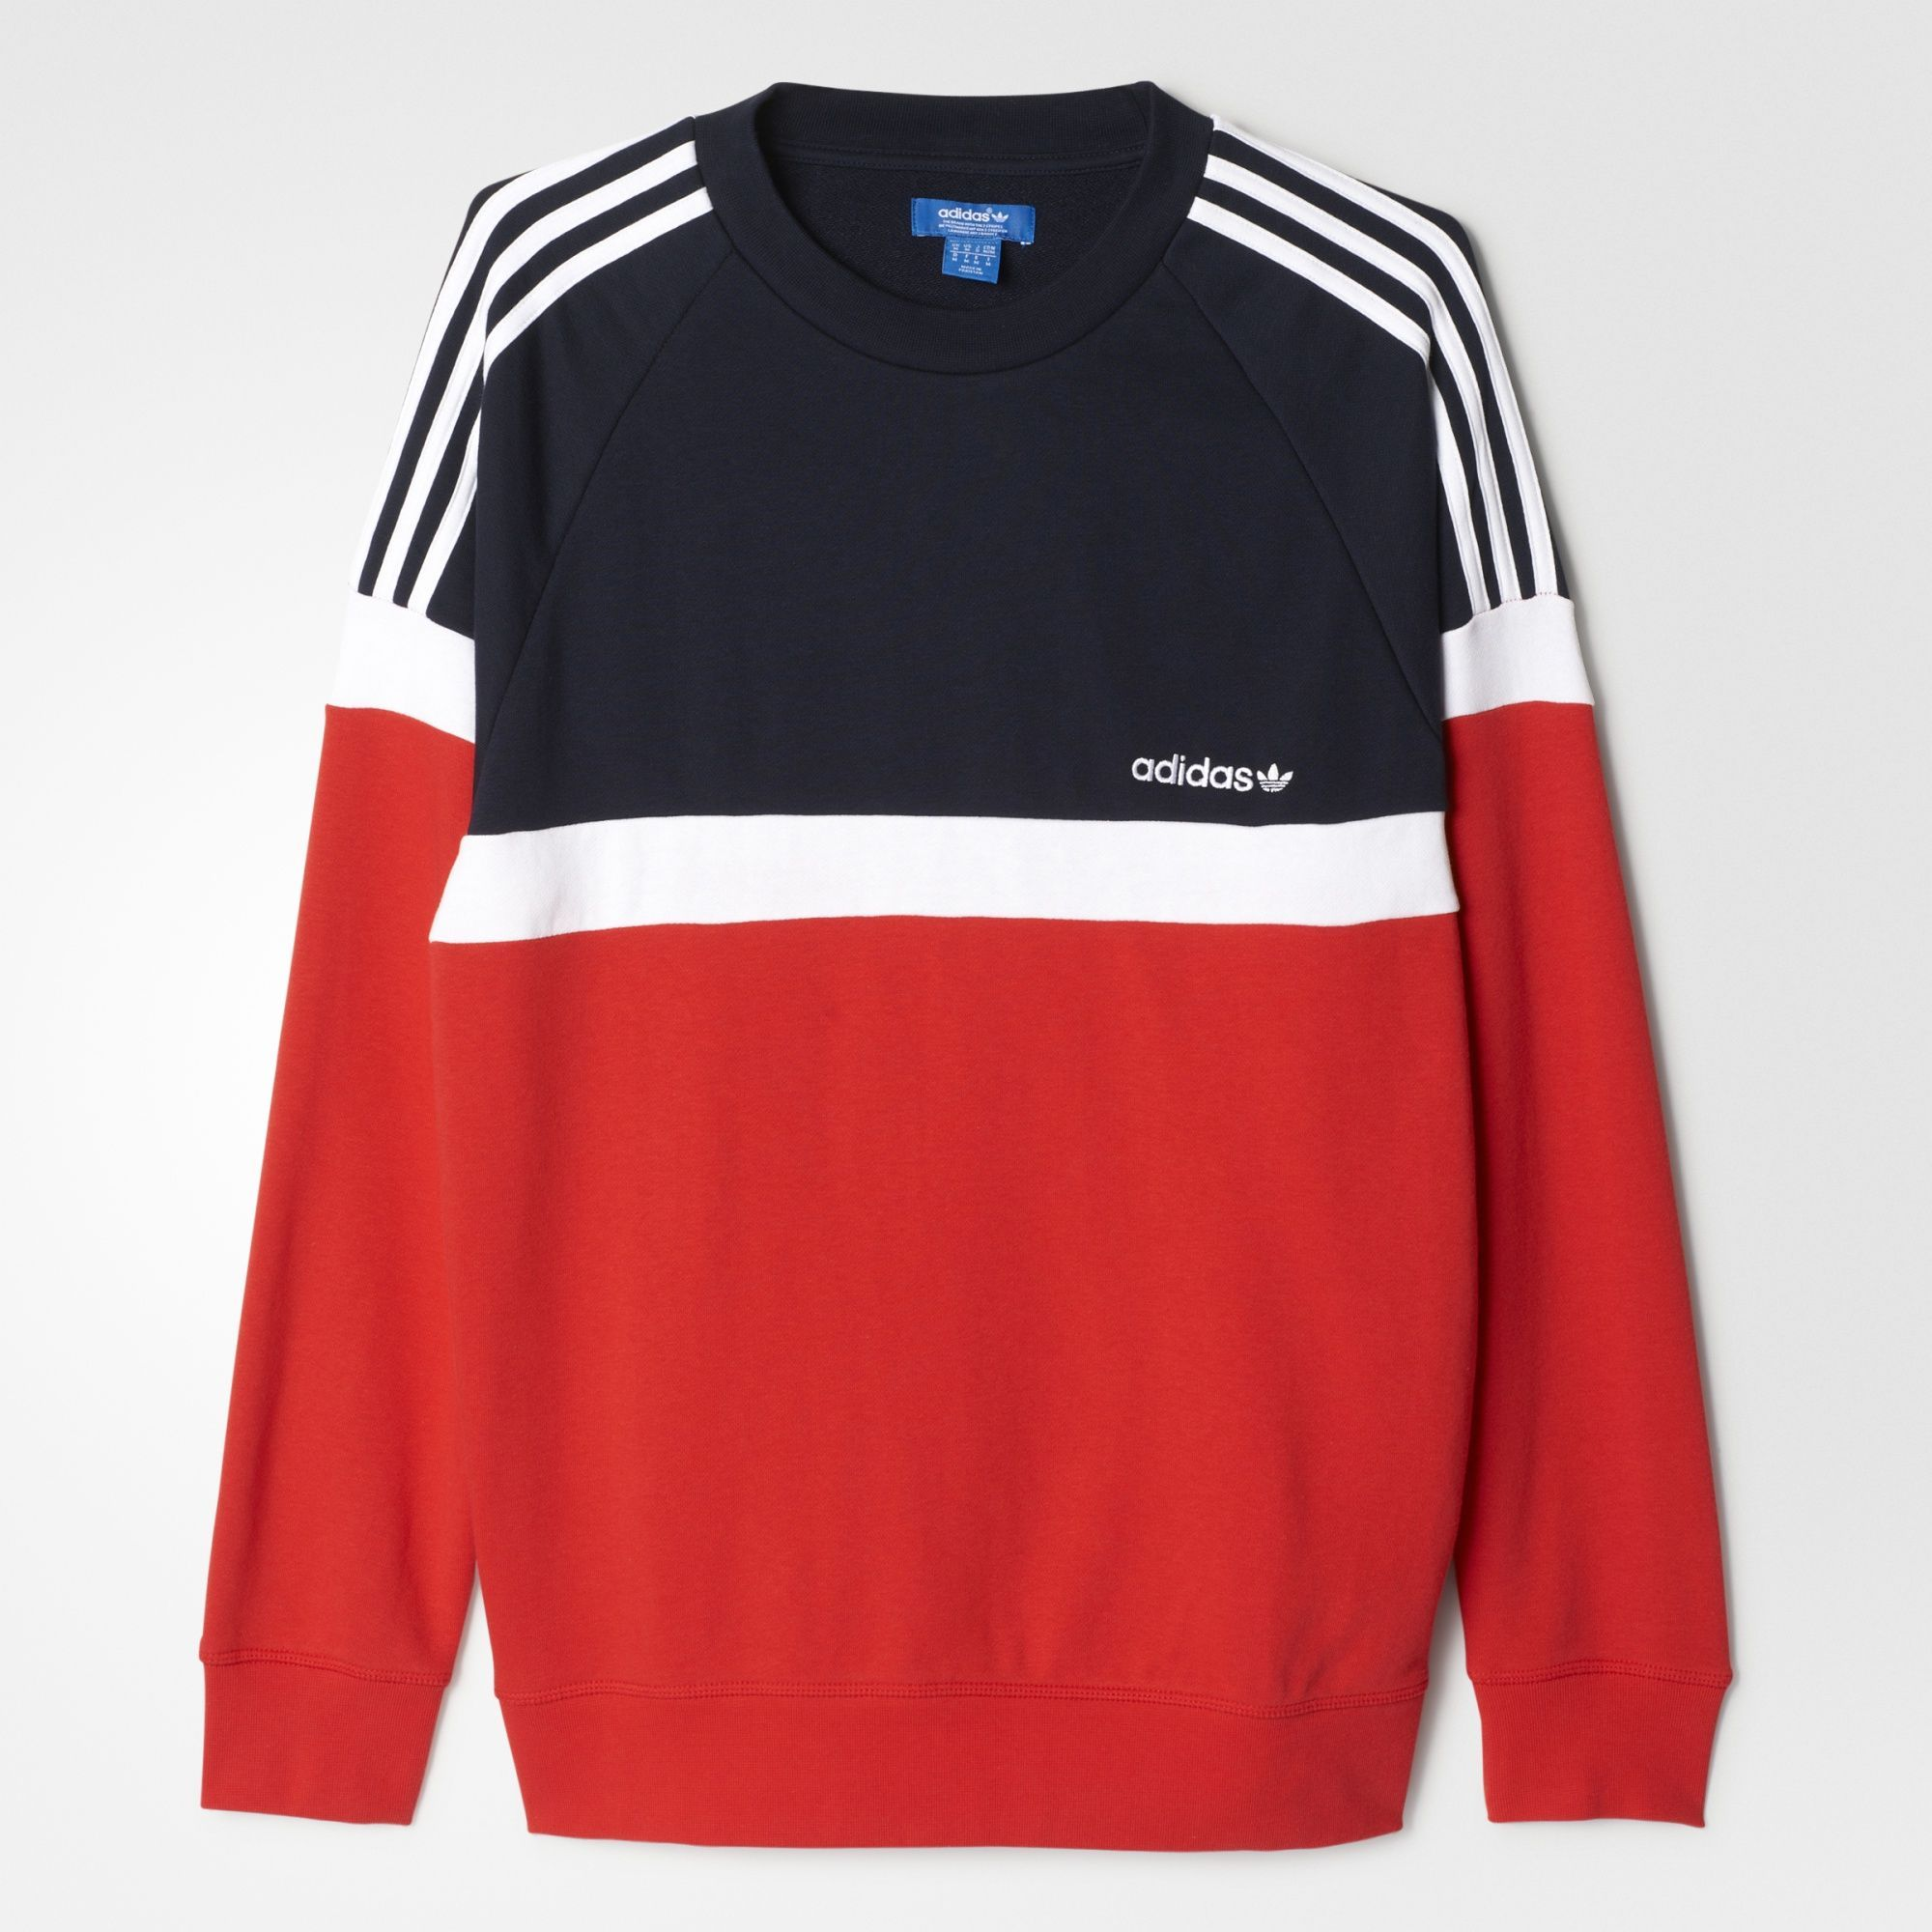 Adidas Itasca   Ropa adidas hombre, Ropa adidas, Moda ropa